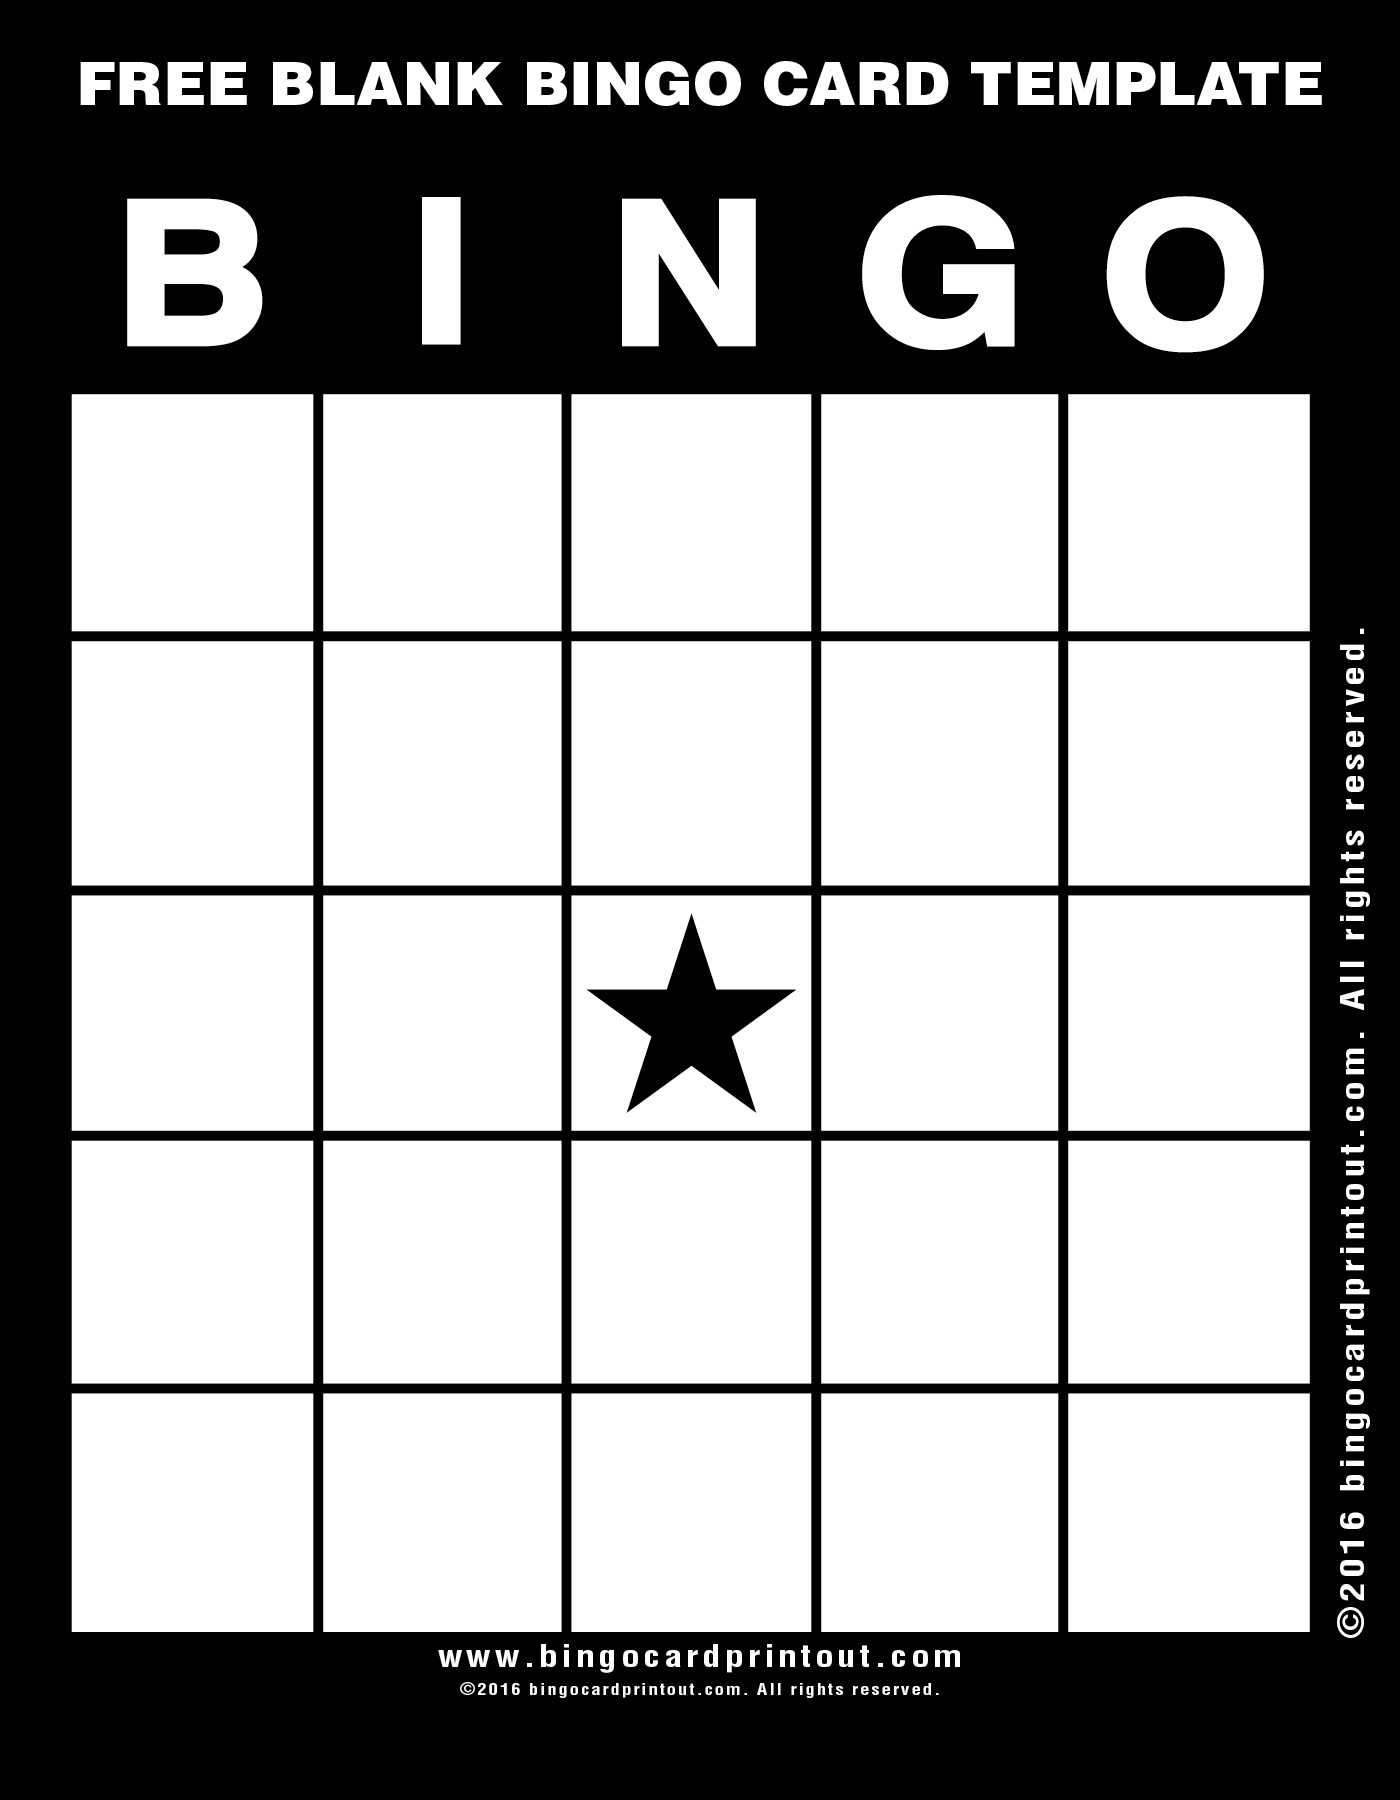 Bingo Template Free ] - Blank Bingo Template 15 Free Psd Intended For Bingo Card Template Word